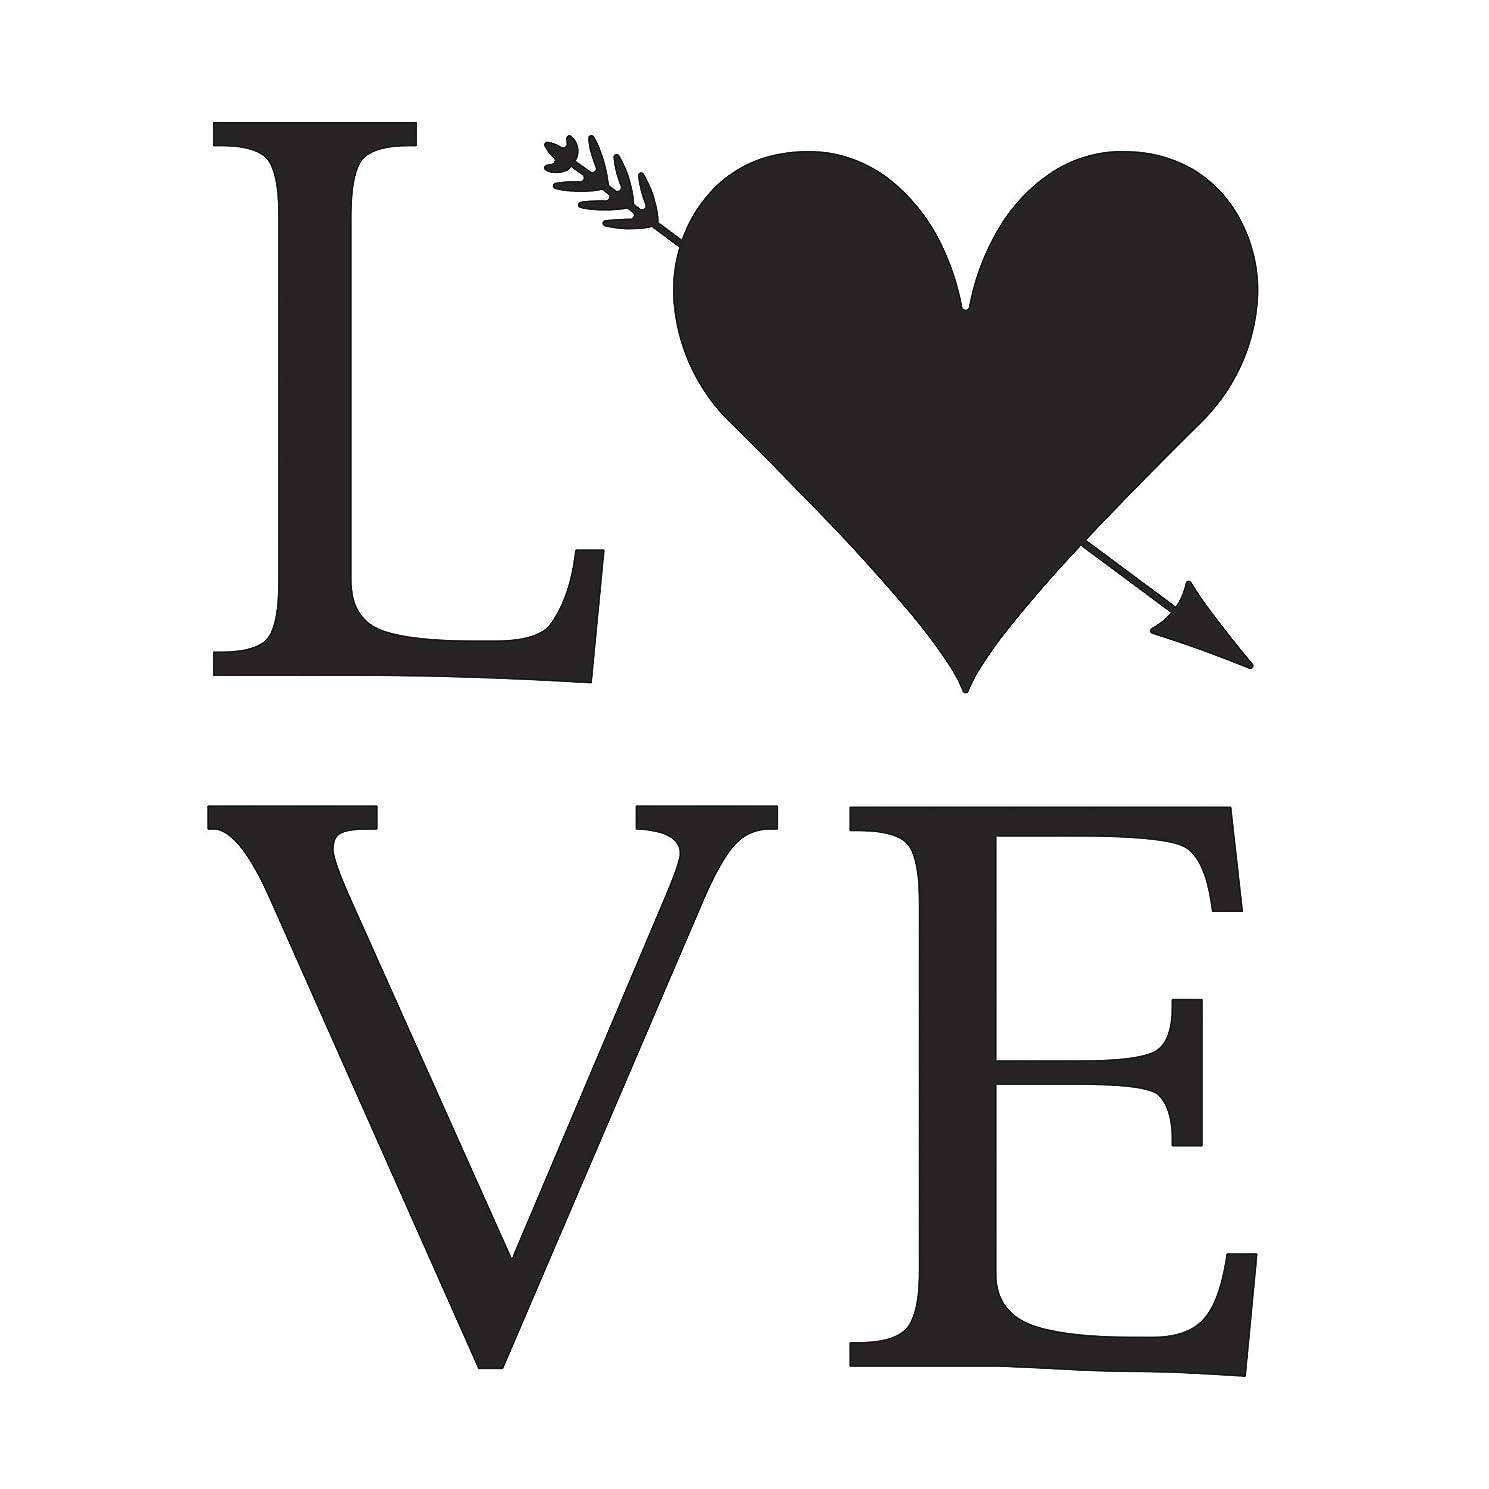 Darice Embossing Folder: Love, 4.25 x 5.75 inches